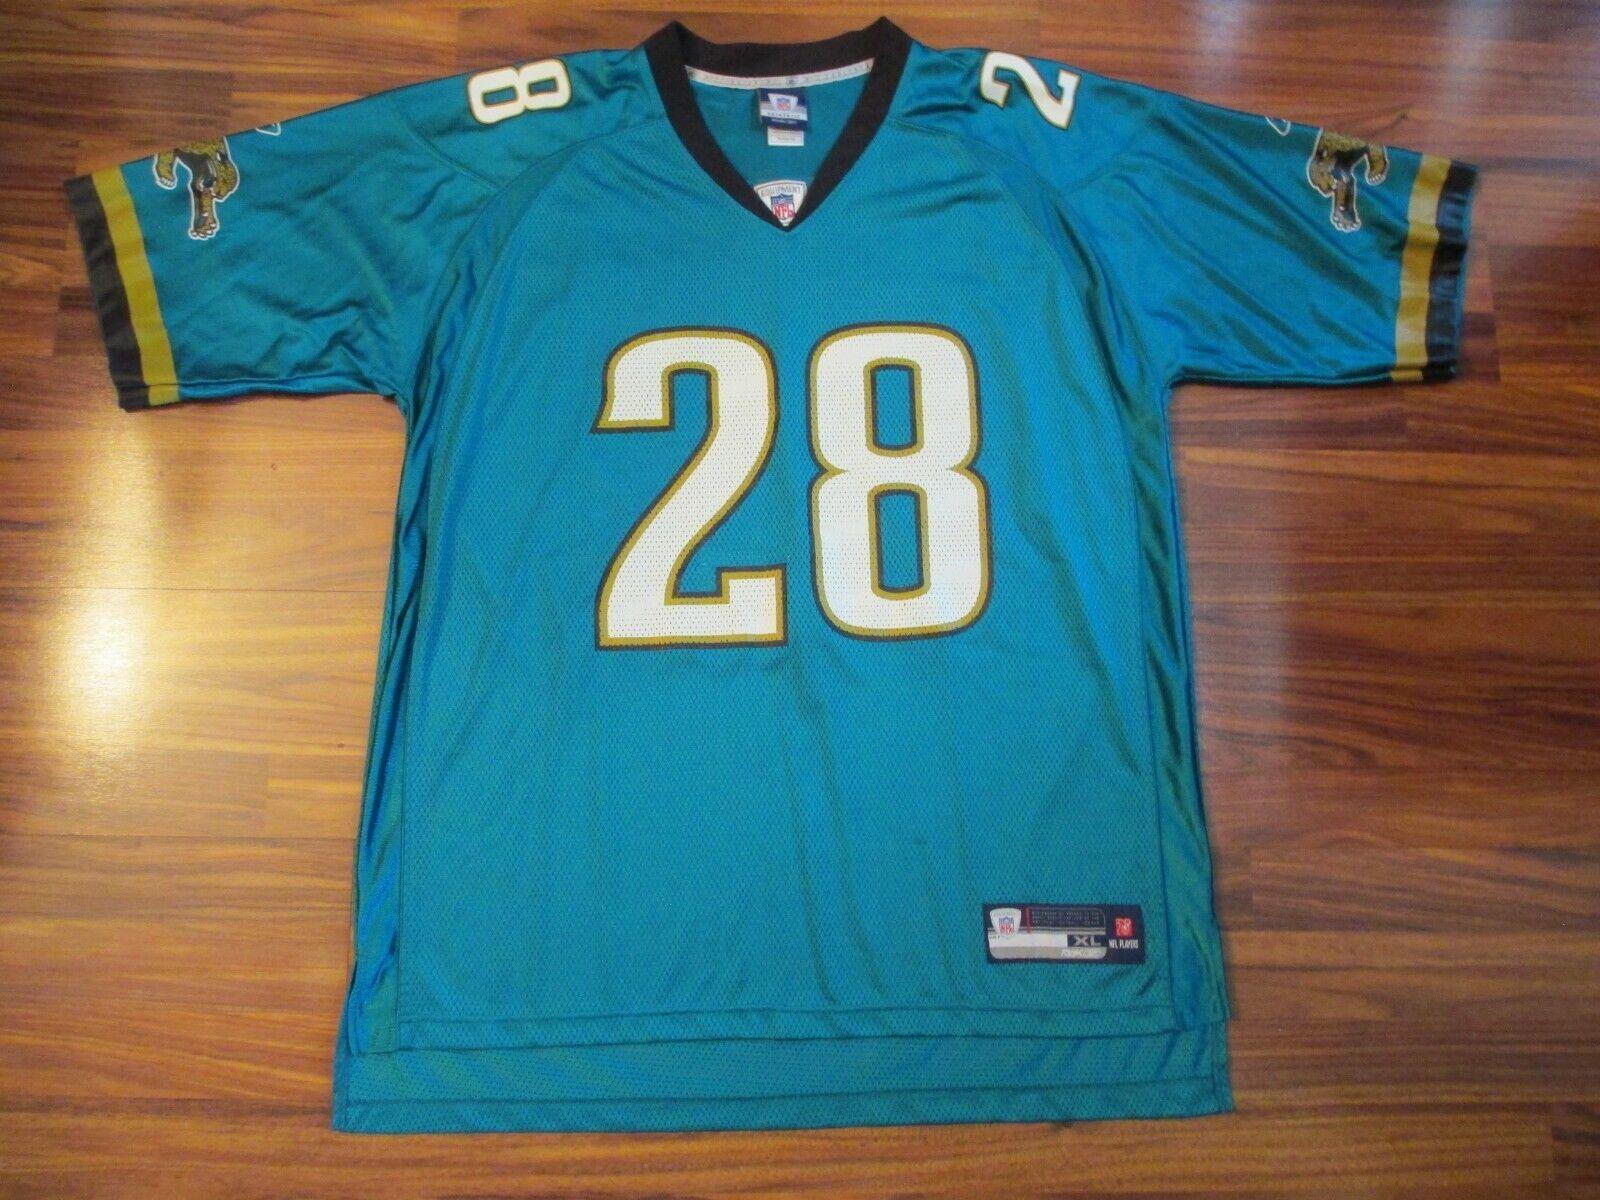 Reebok Jacksonville Jaguars FRED TAYLOR #28 Teal Jersey - XL